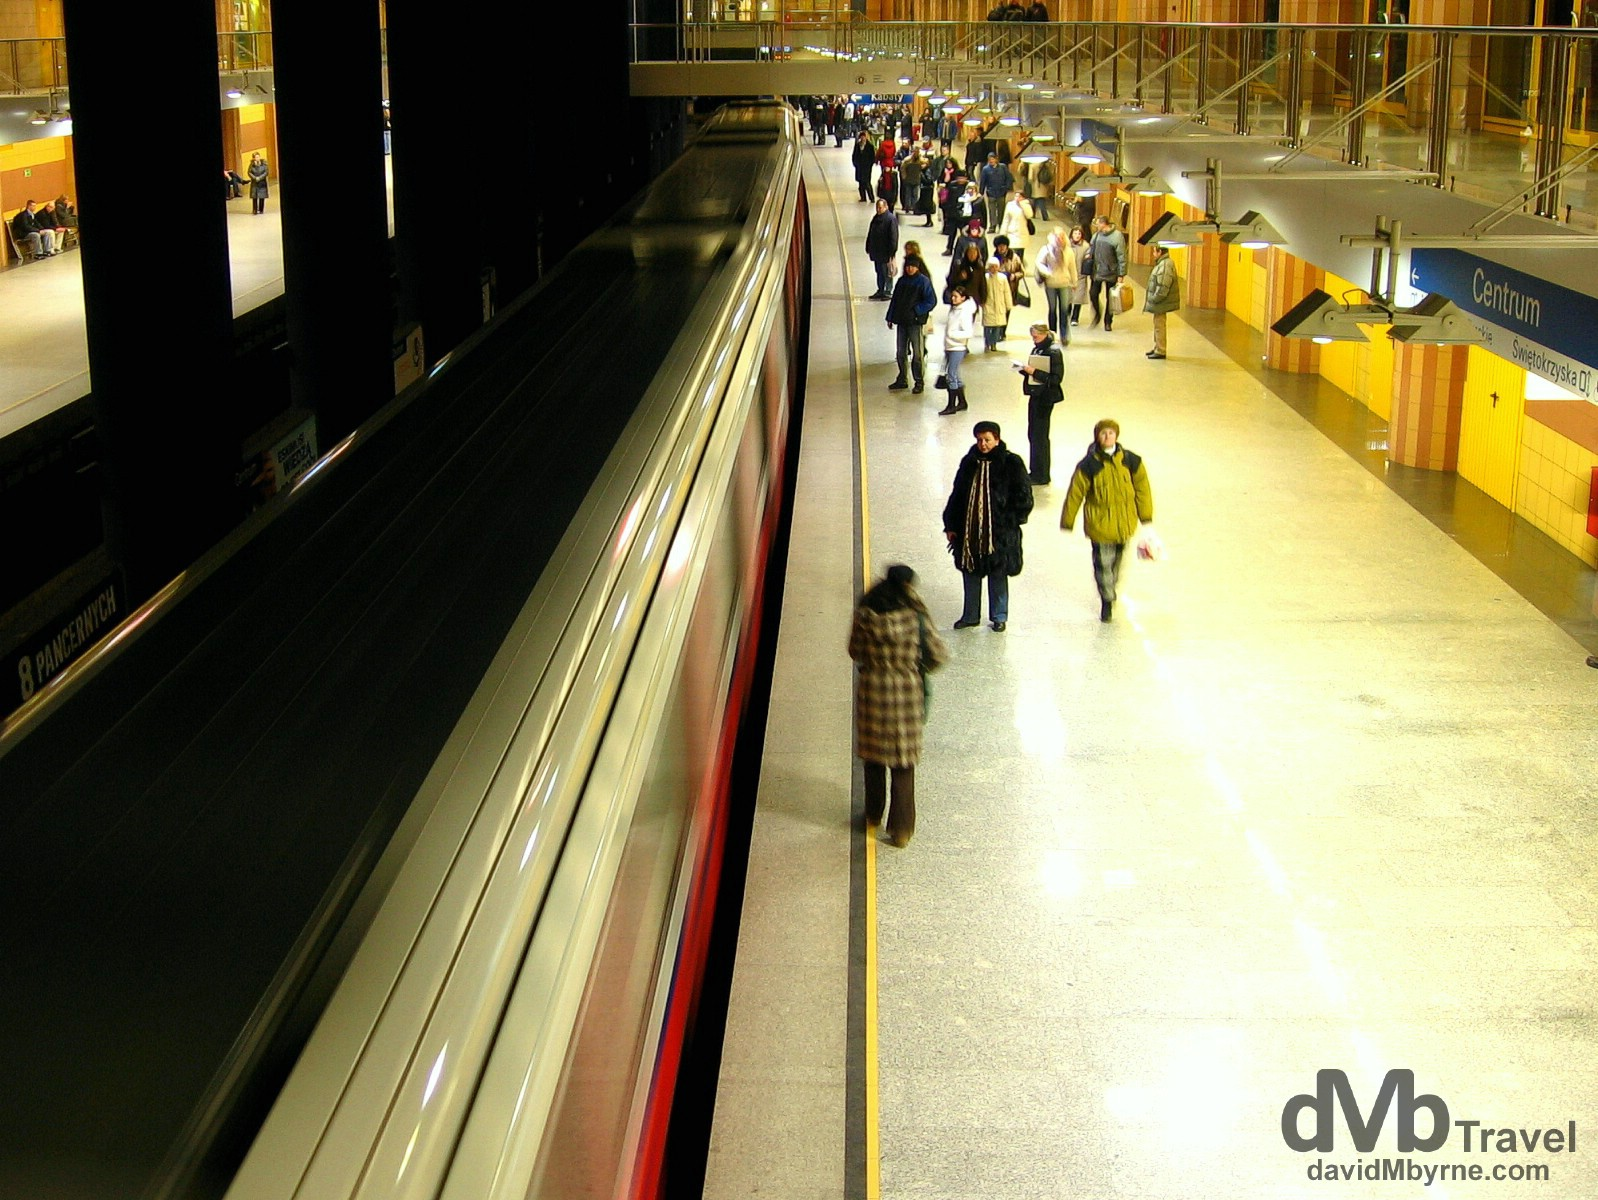 Centrum metro station in Warsaw, Poland. March 5, 2006.